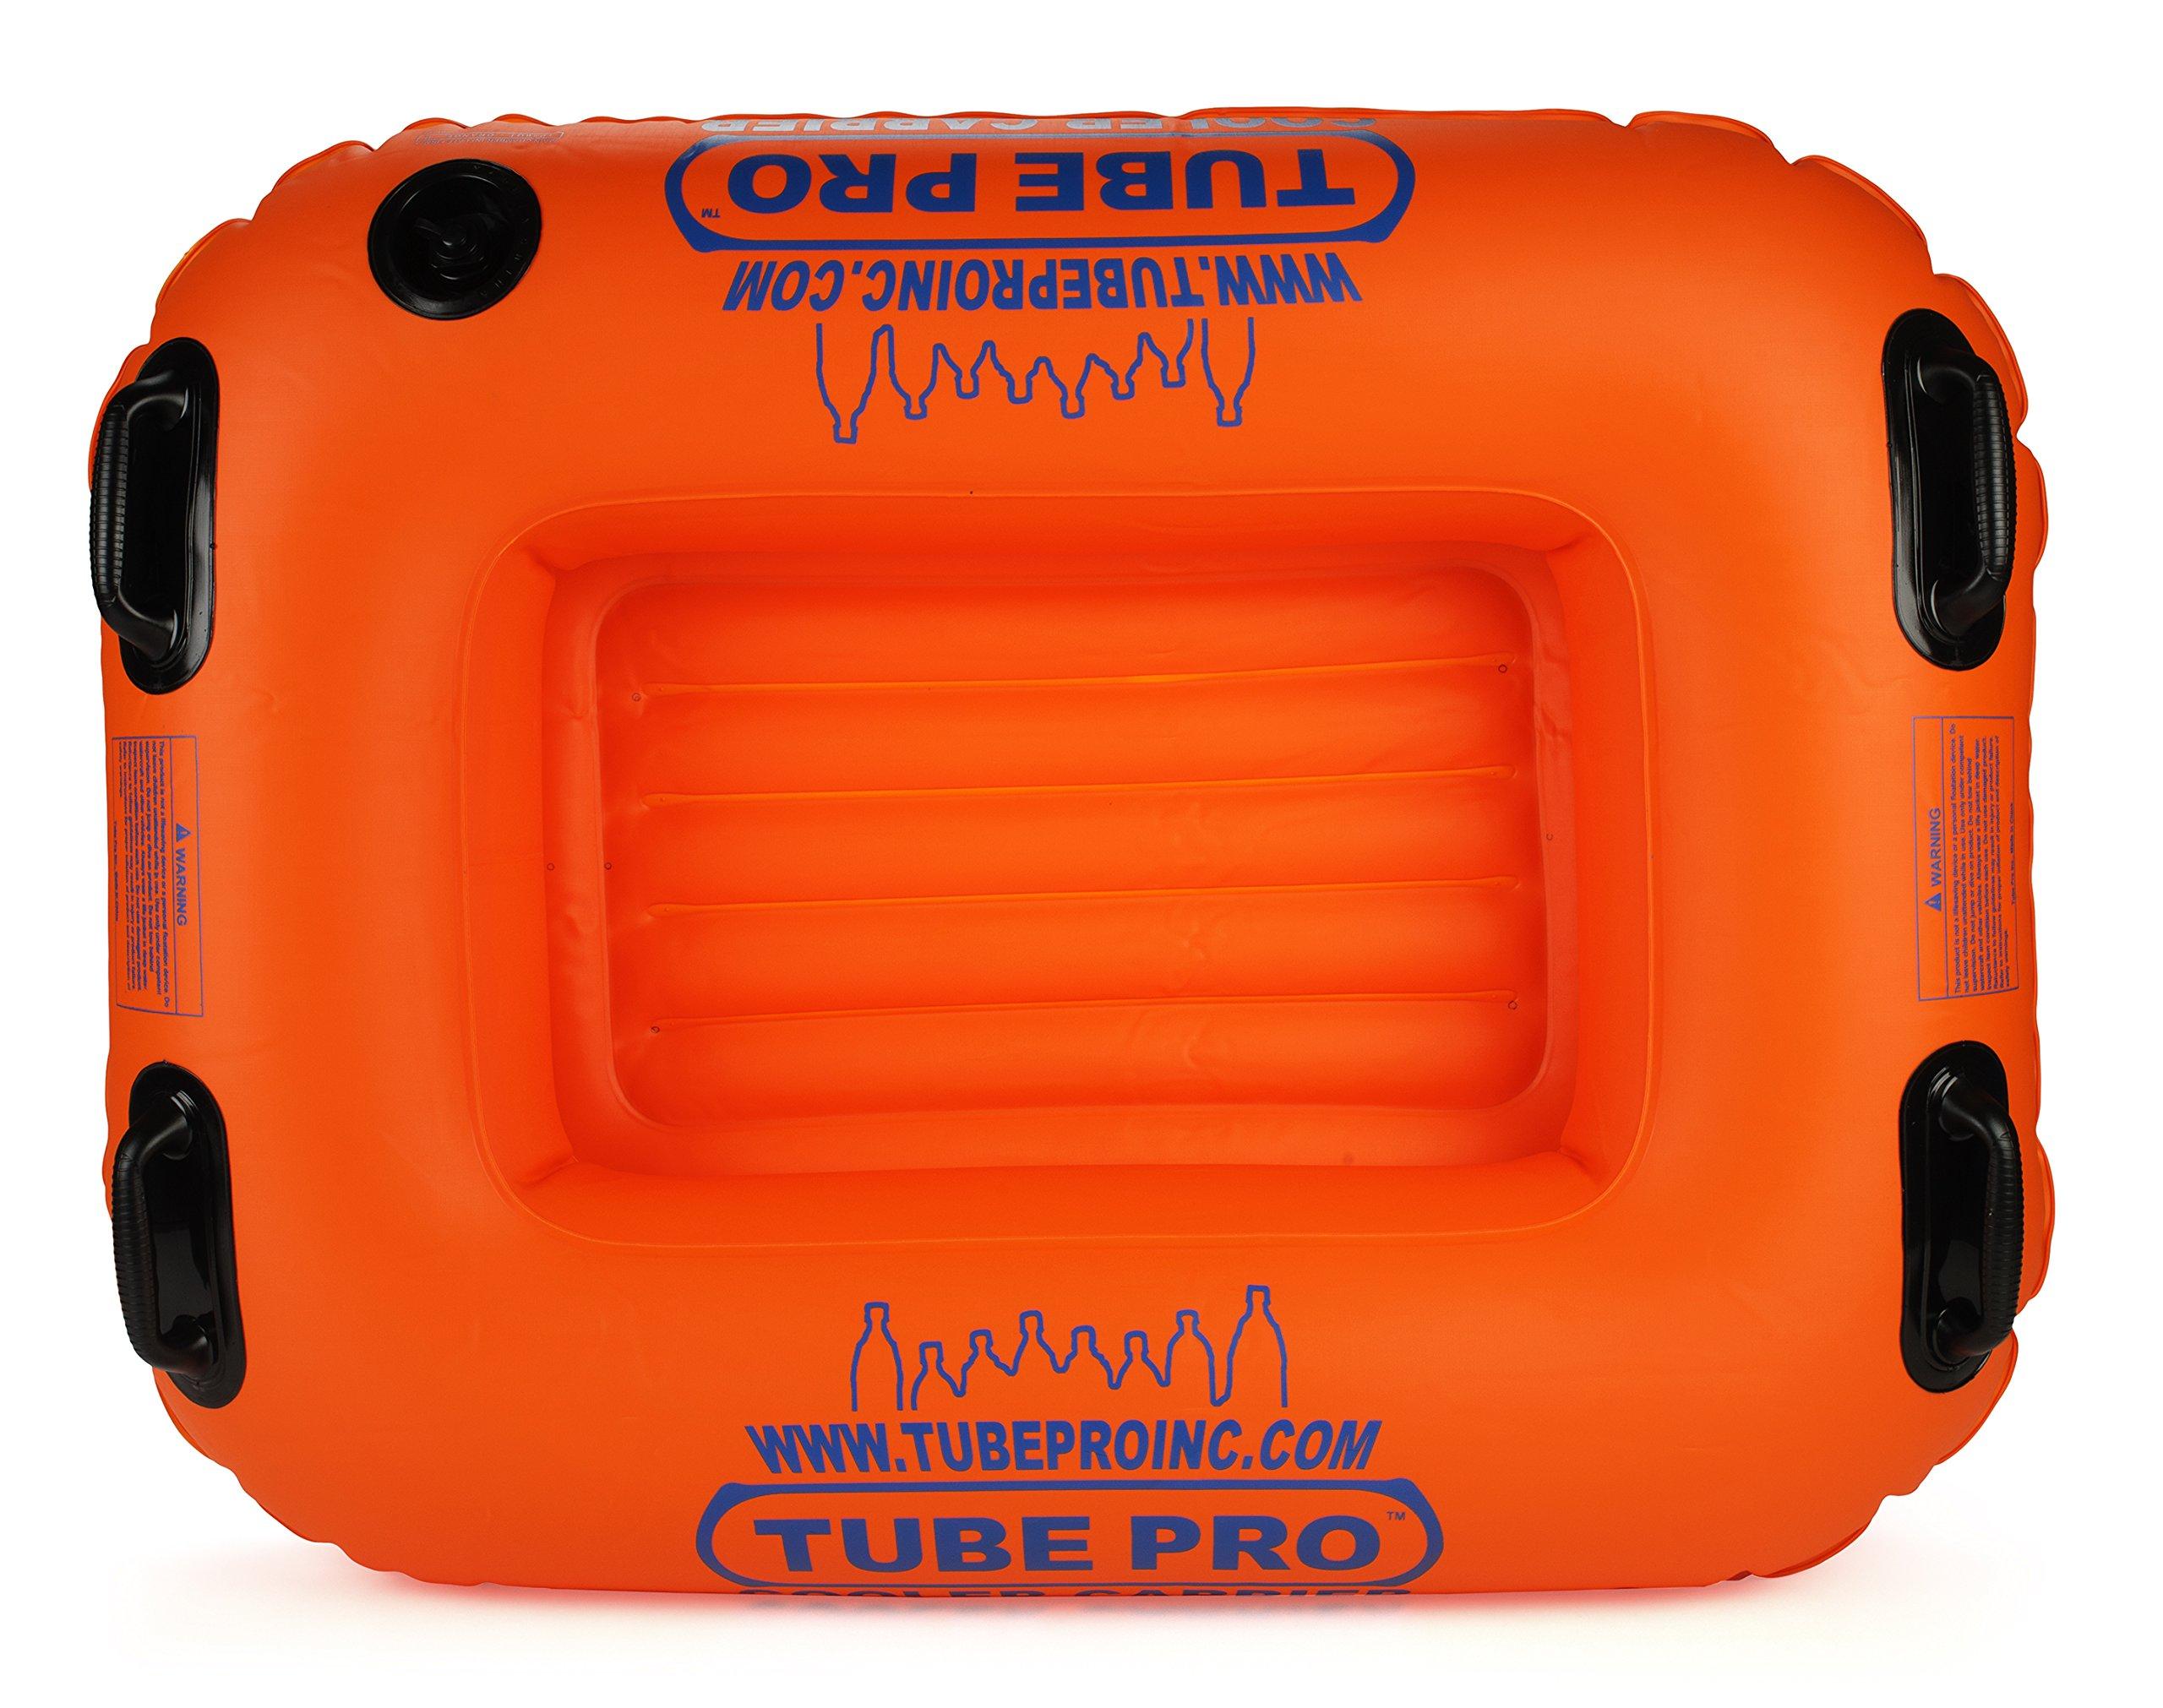 Tube Pro Premium Orange River Cooler Carrier 50 Quart by Tube Pro (Image #2)